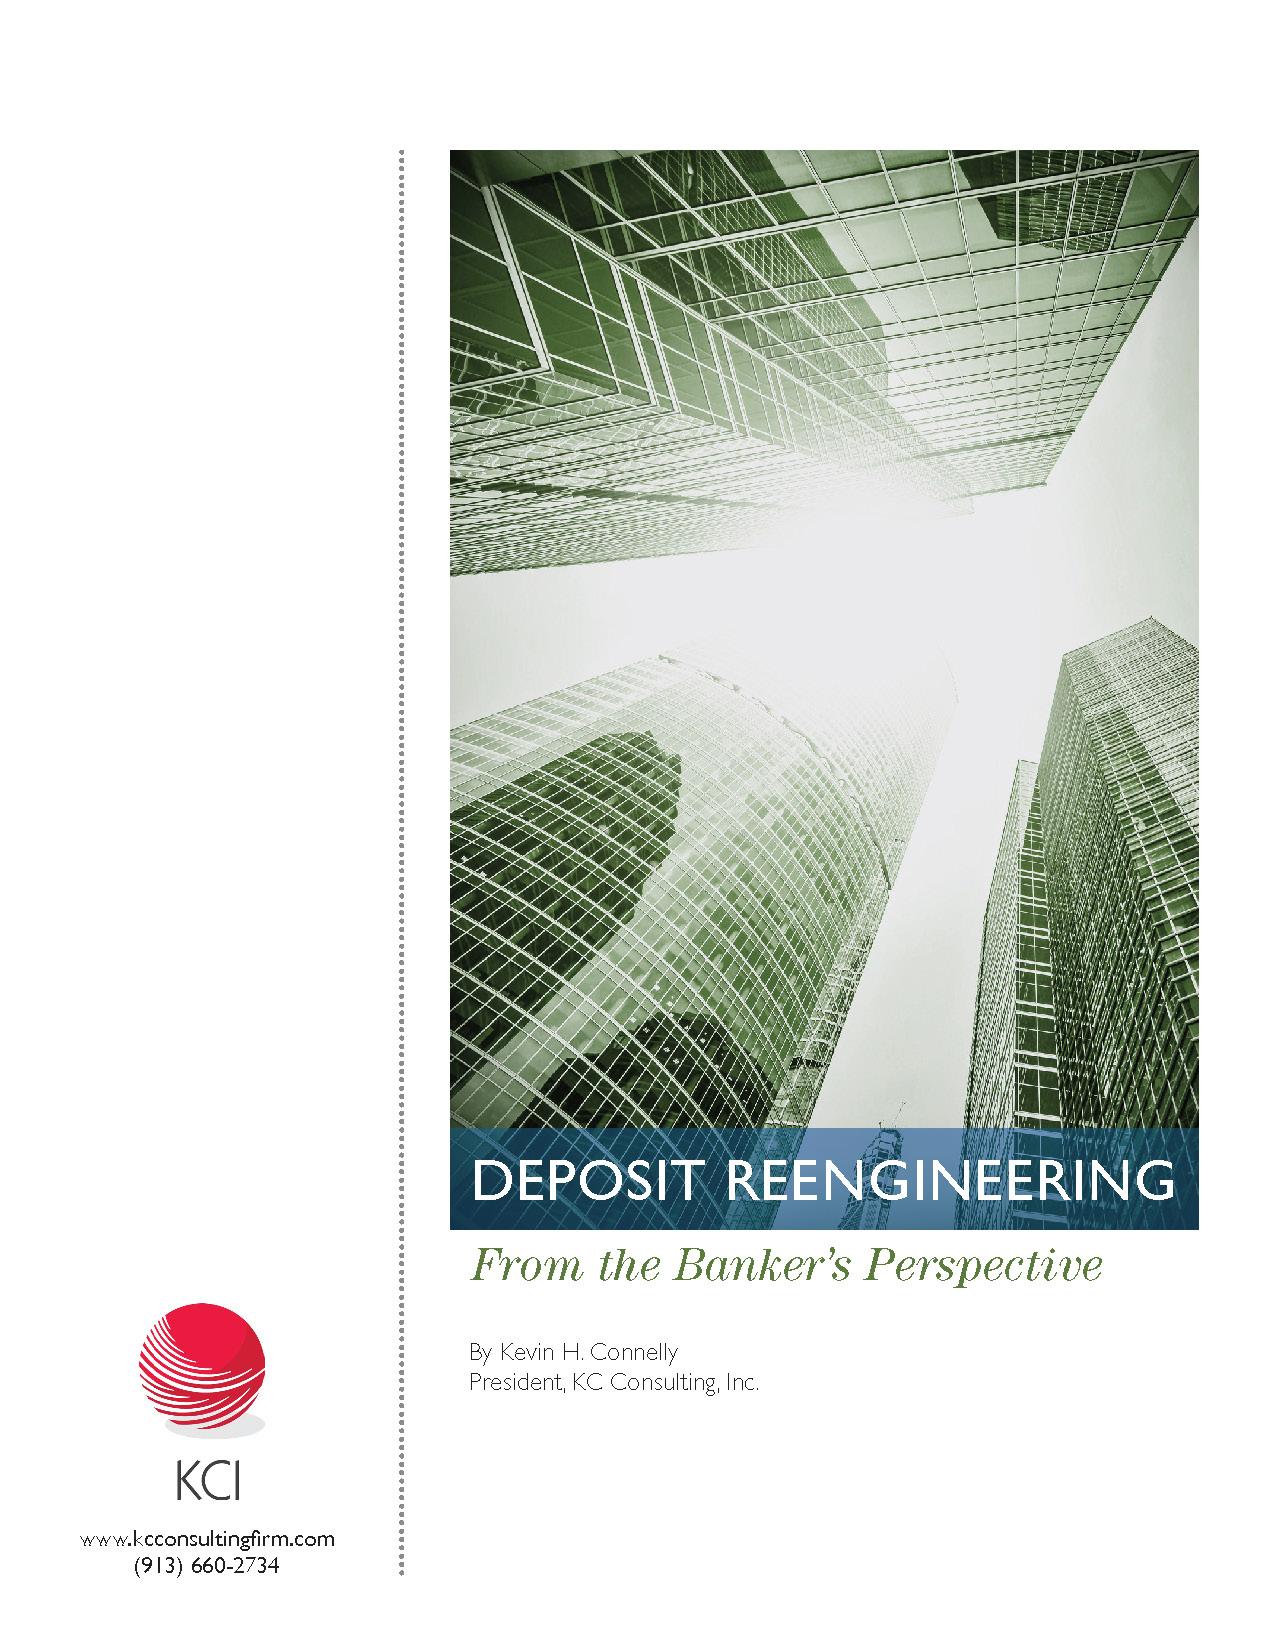 KCI Deposit Reengineering